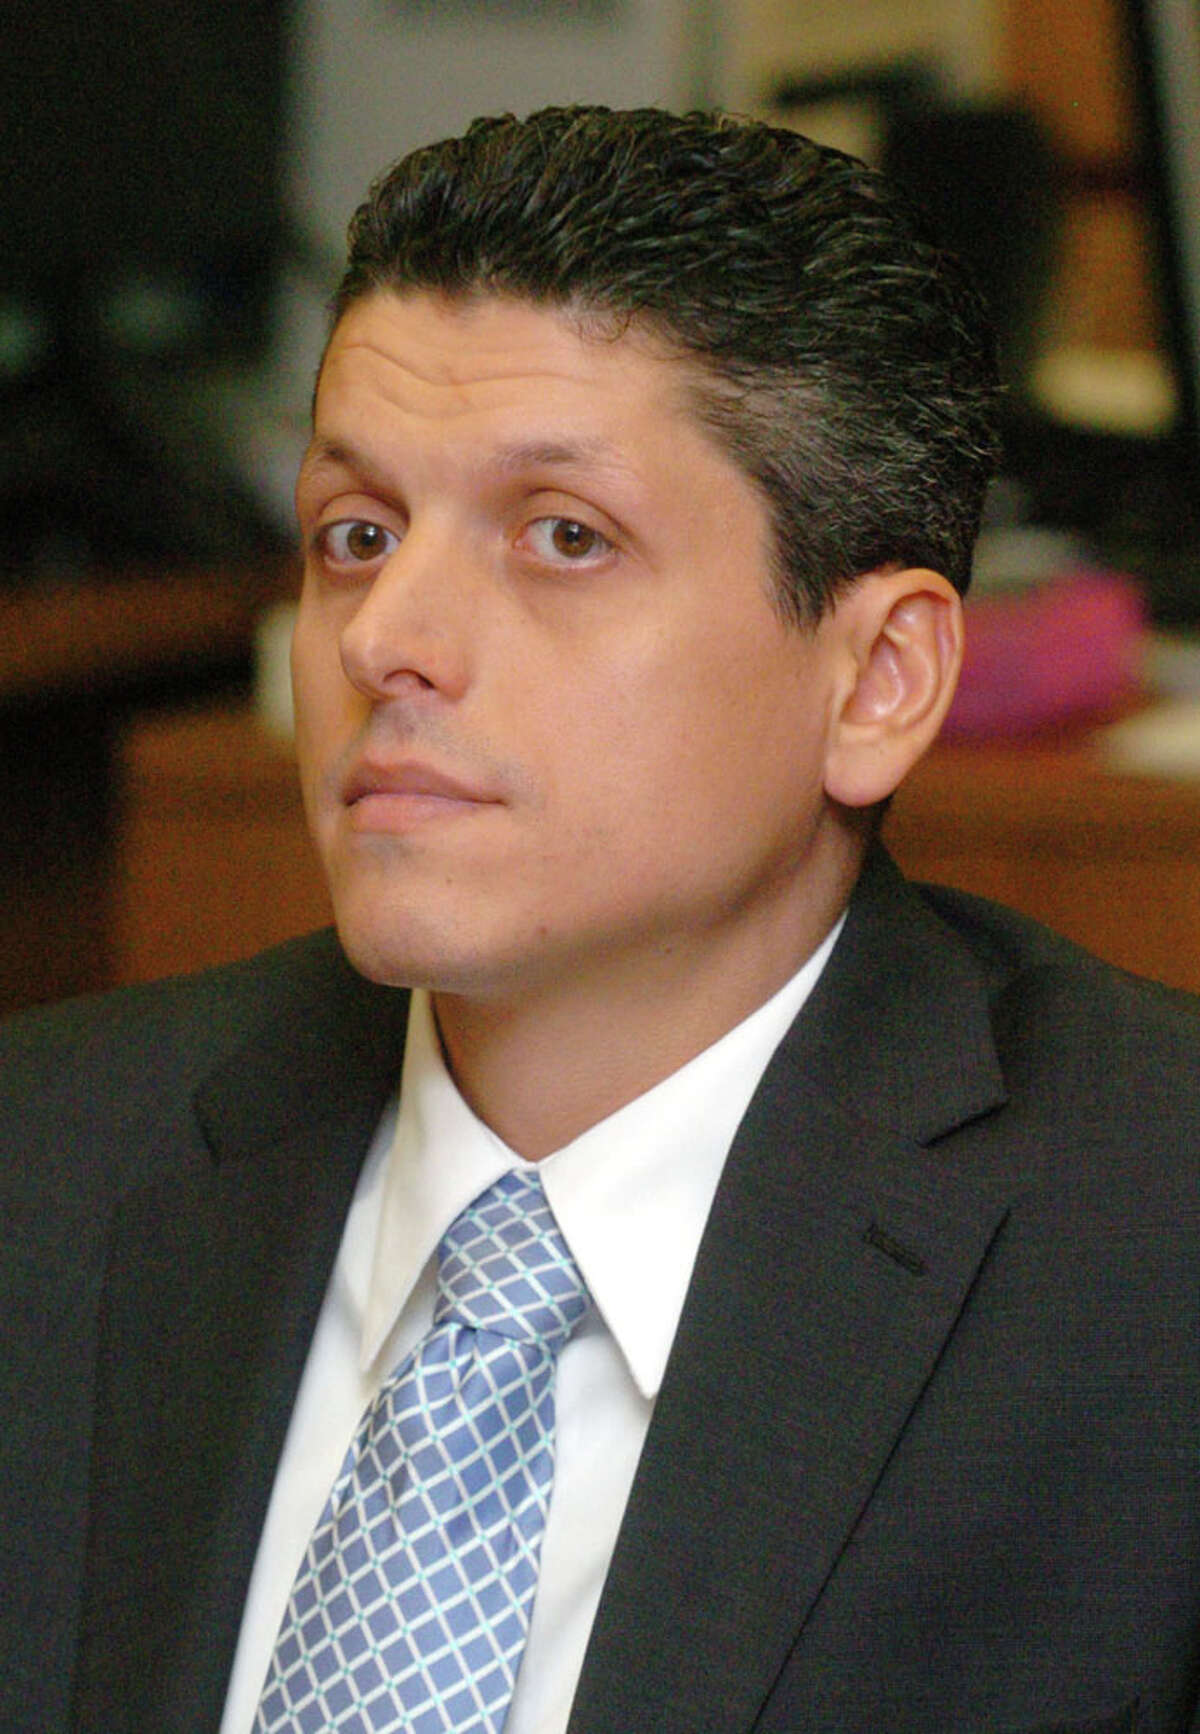 Marash Gojcaj listens to courtroom proceedings at the Superior Court in Danbury Sept., 15, 2010.